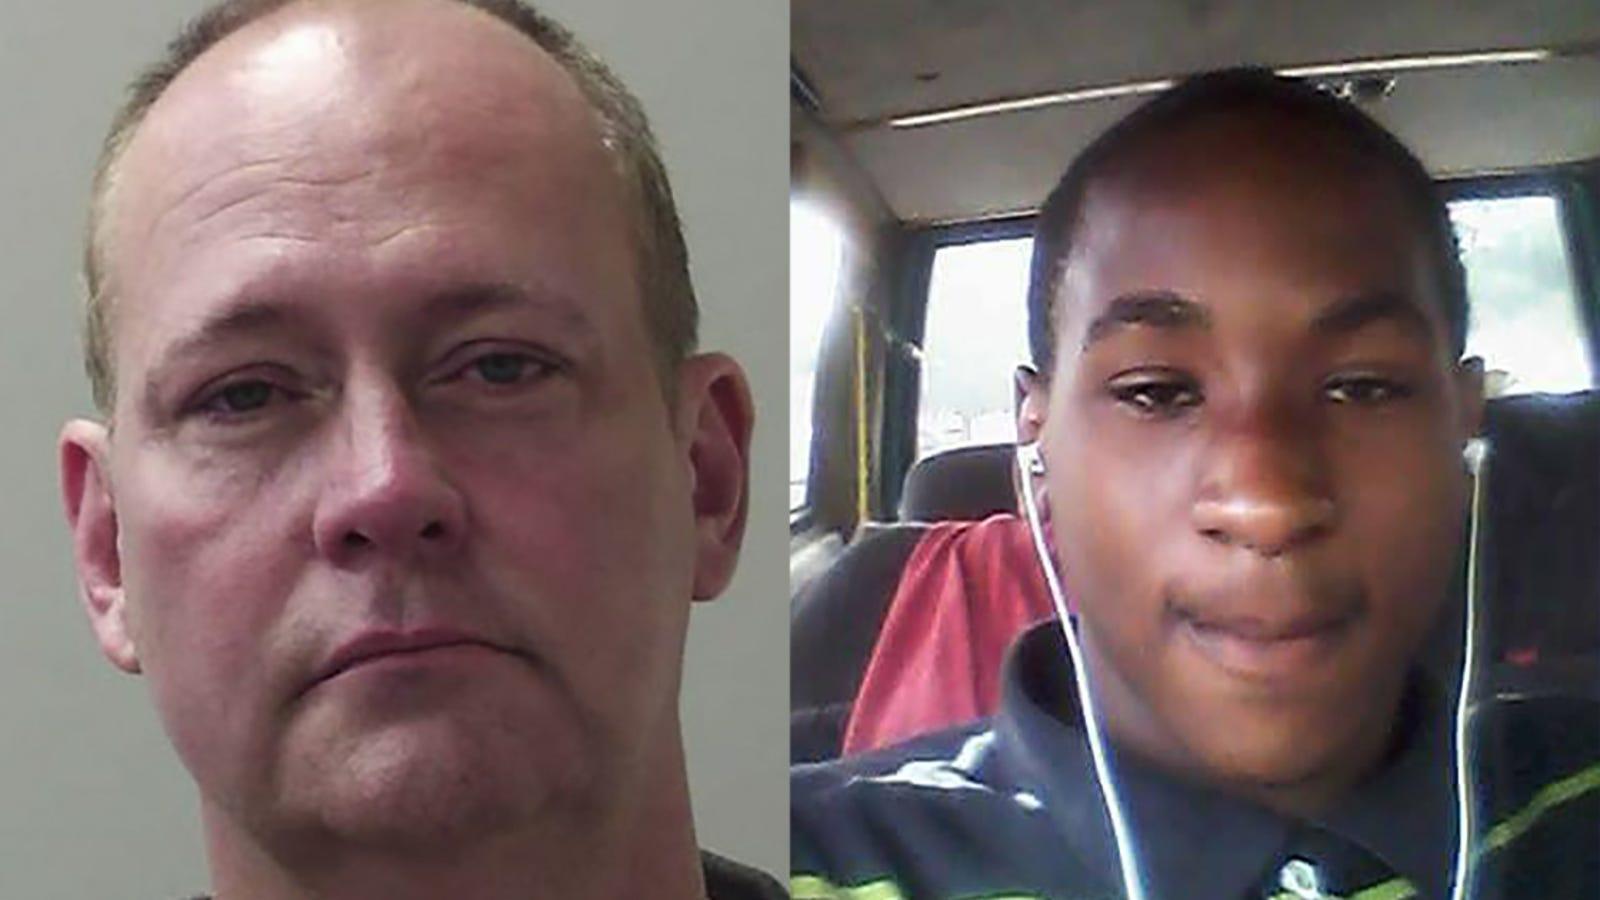 Jury Finds Man Dubbed 'George Zimmerman ofAlabama' Guilty in Killing of Unarmed Black Teen